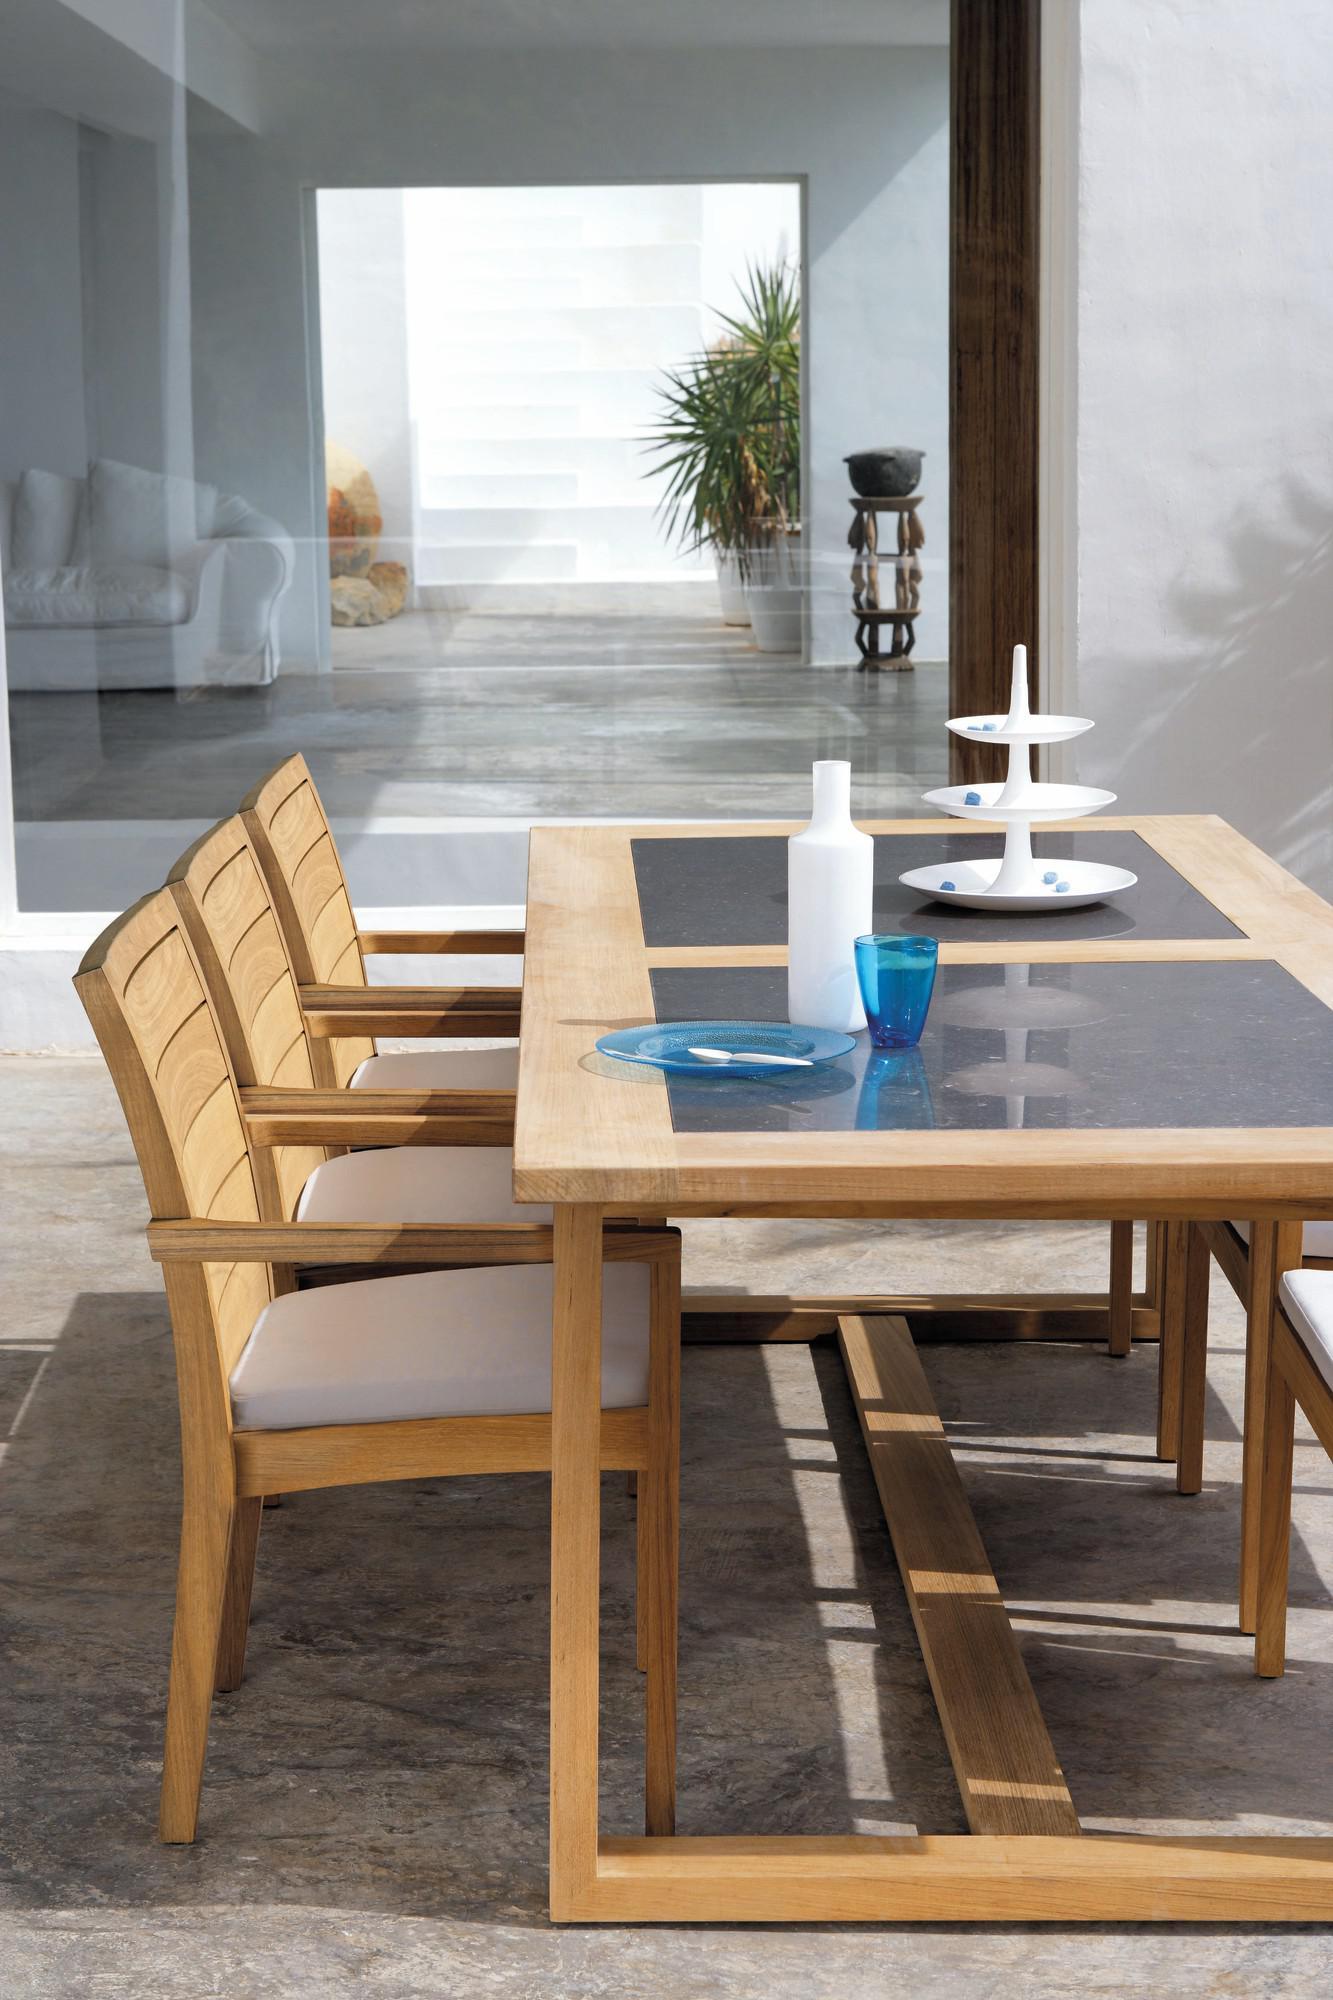 Tavolo da pranzo per esterni Siena - teak - listelli teak ...